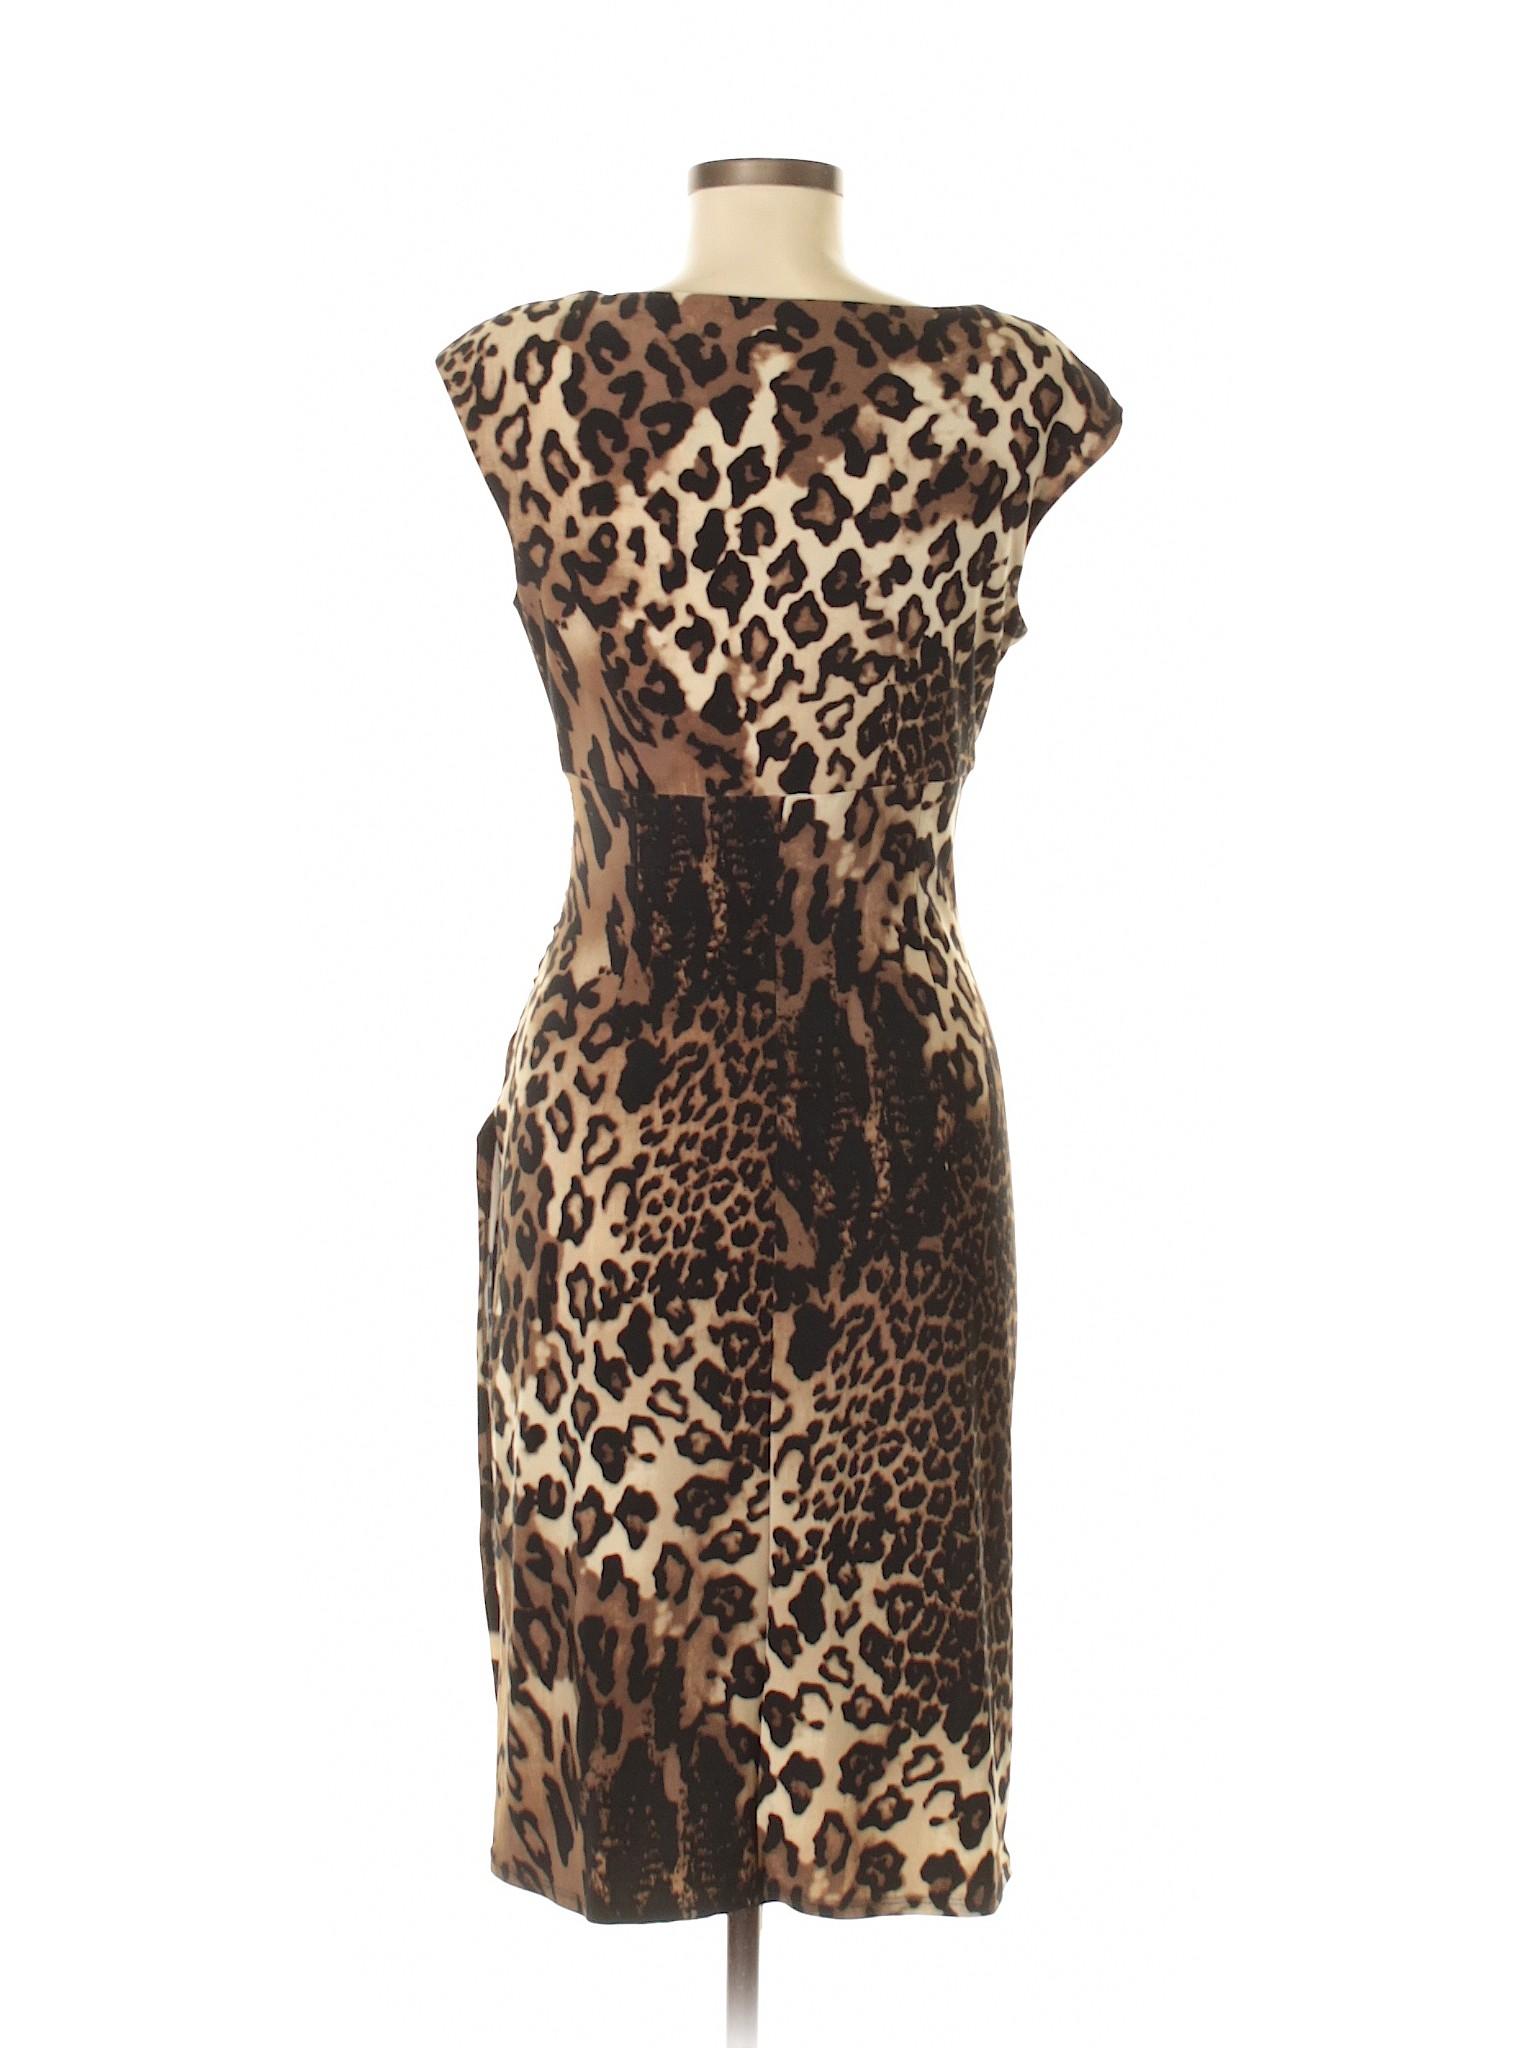 Dress by Lauren Casual Ralph winter Lauren Boutique qZYUE